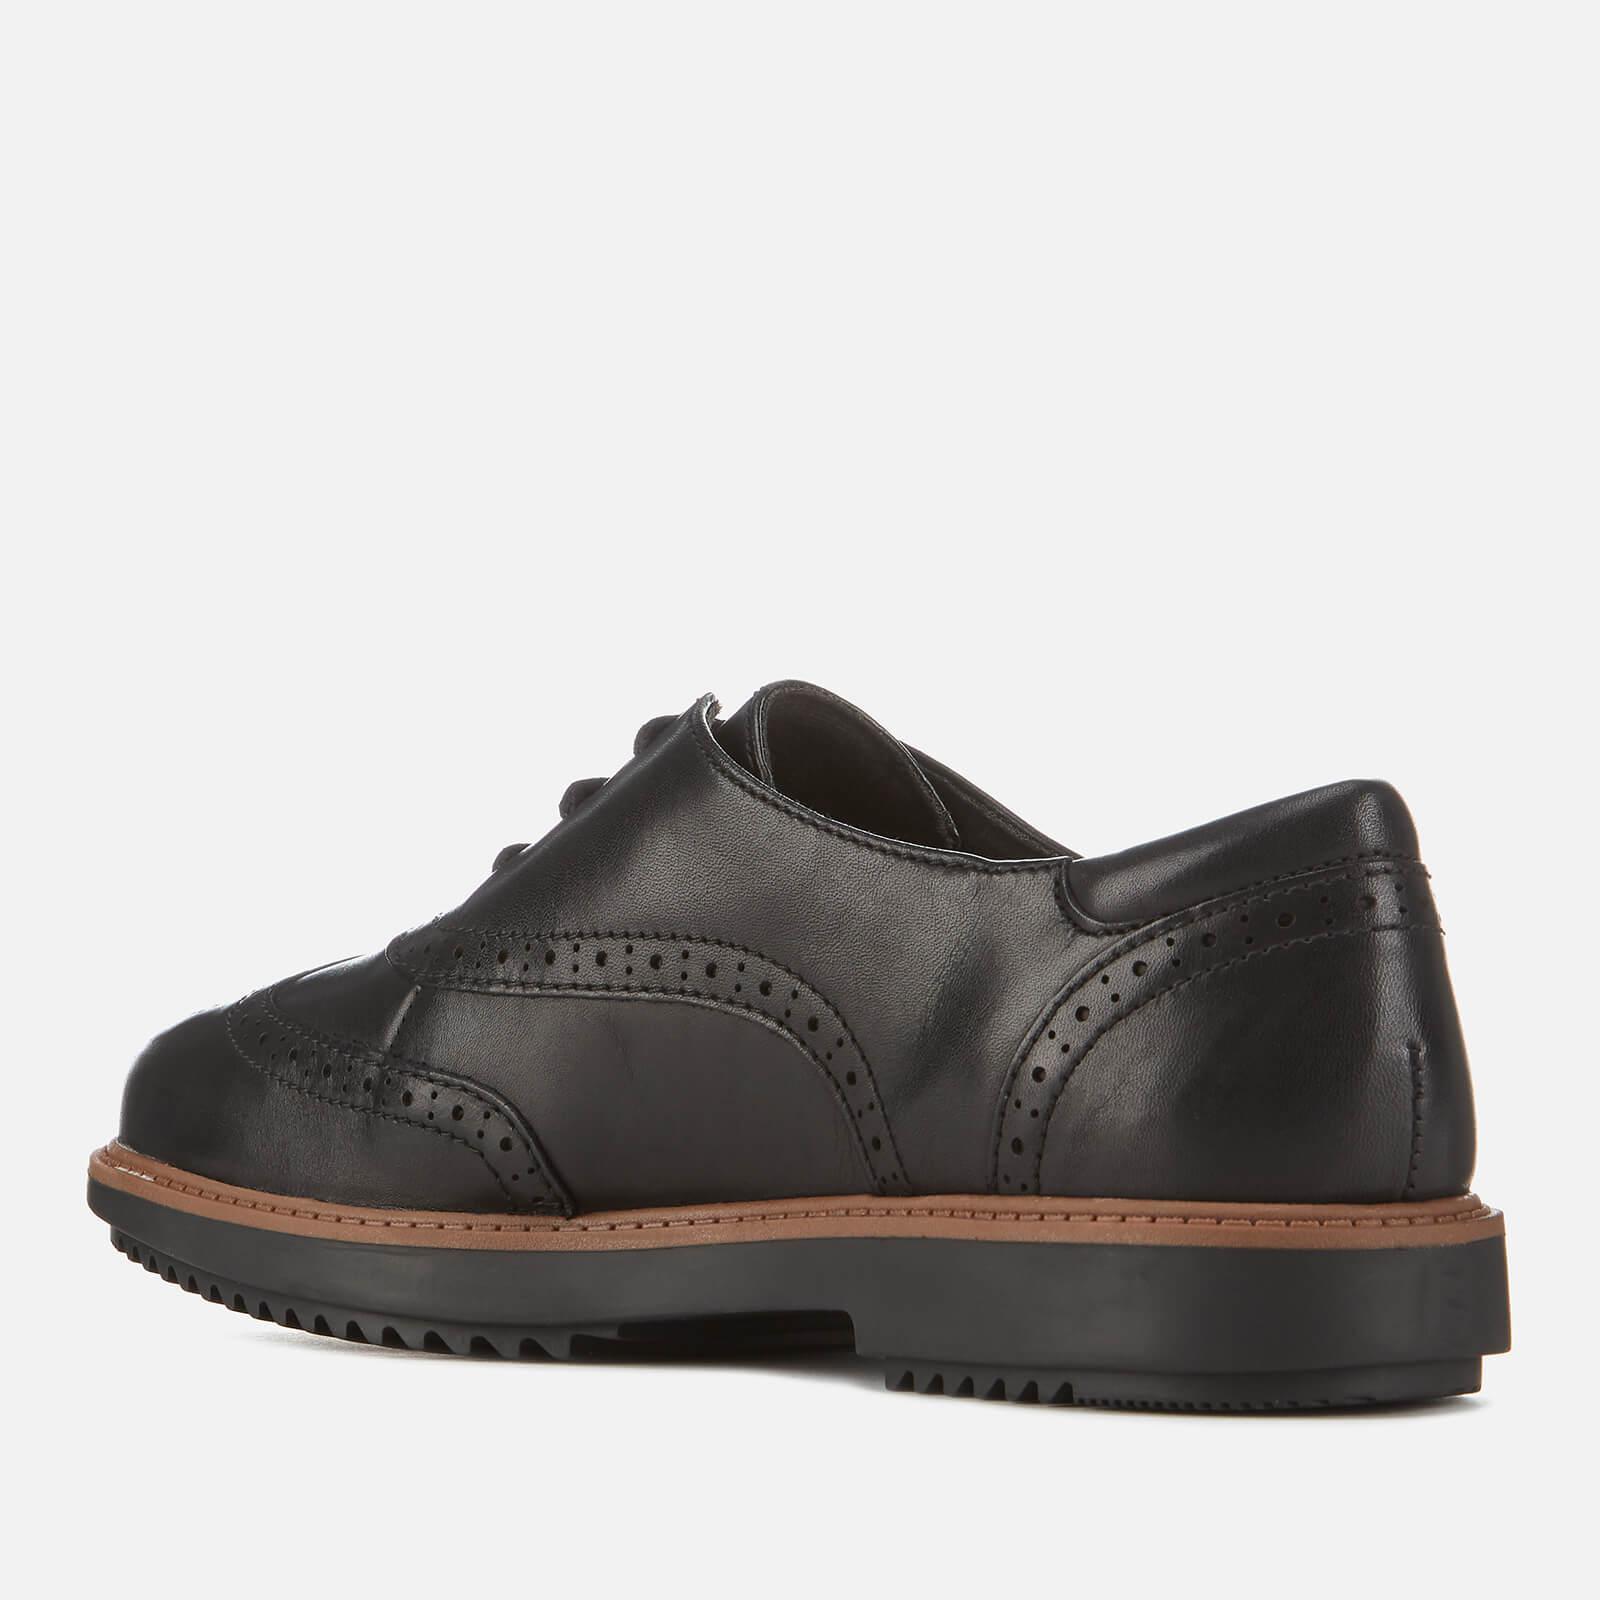 visto ropa considerado Piscina  Clarks Leather Raisie Hilde S Wide Fit Brogues 6 Uk Black - Save 29% - Lyst